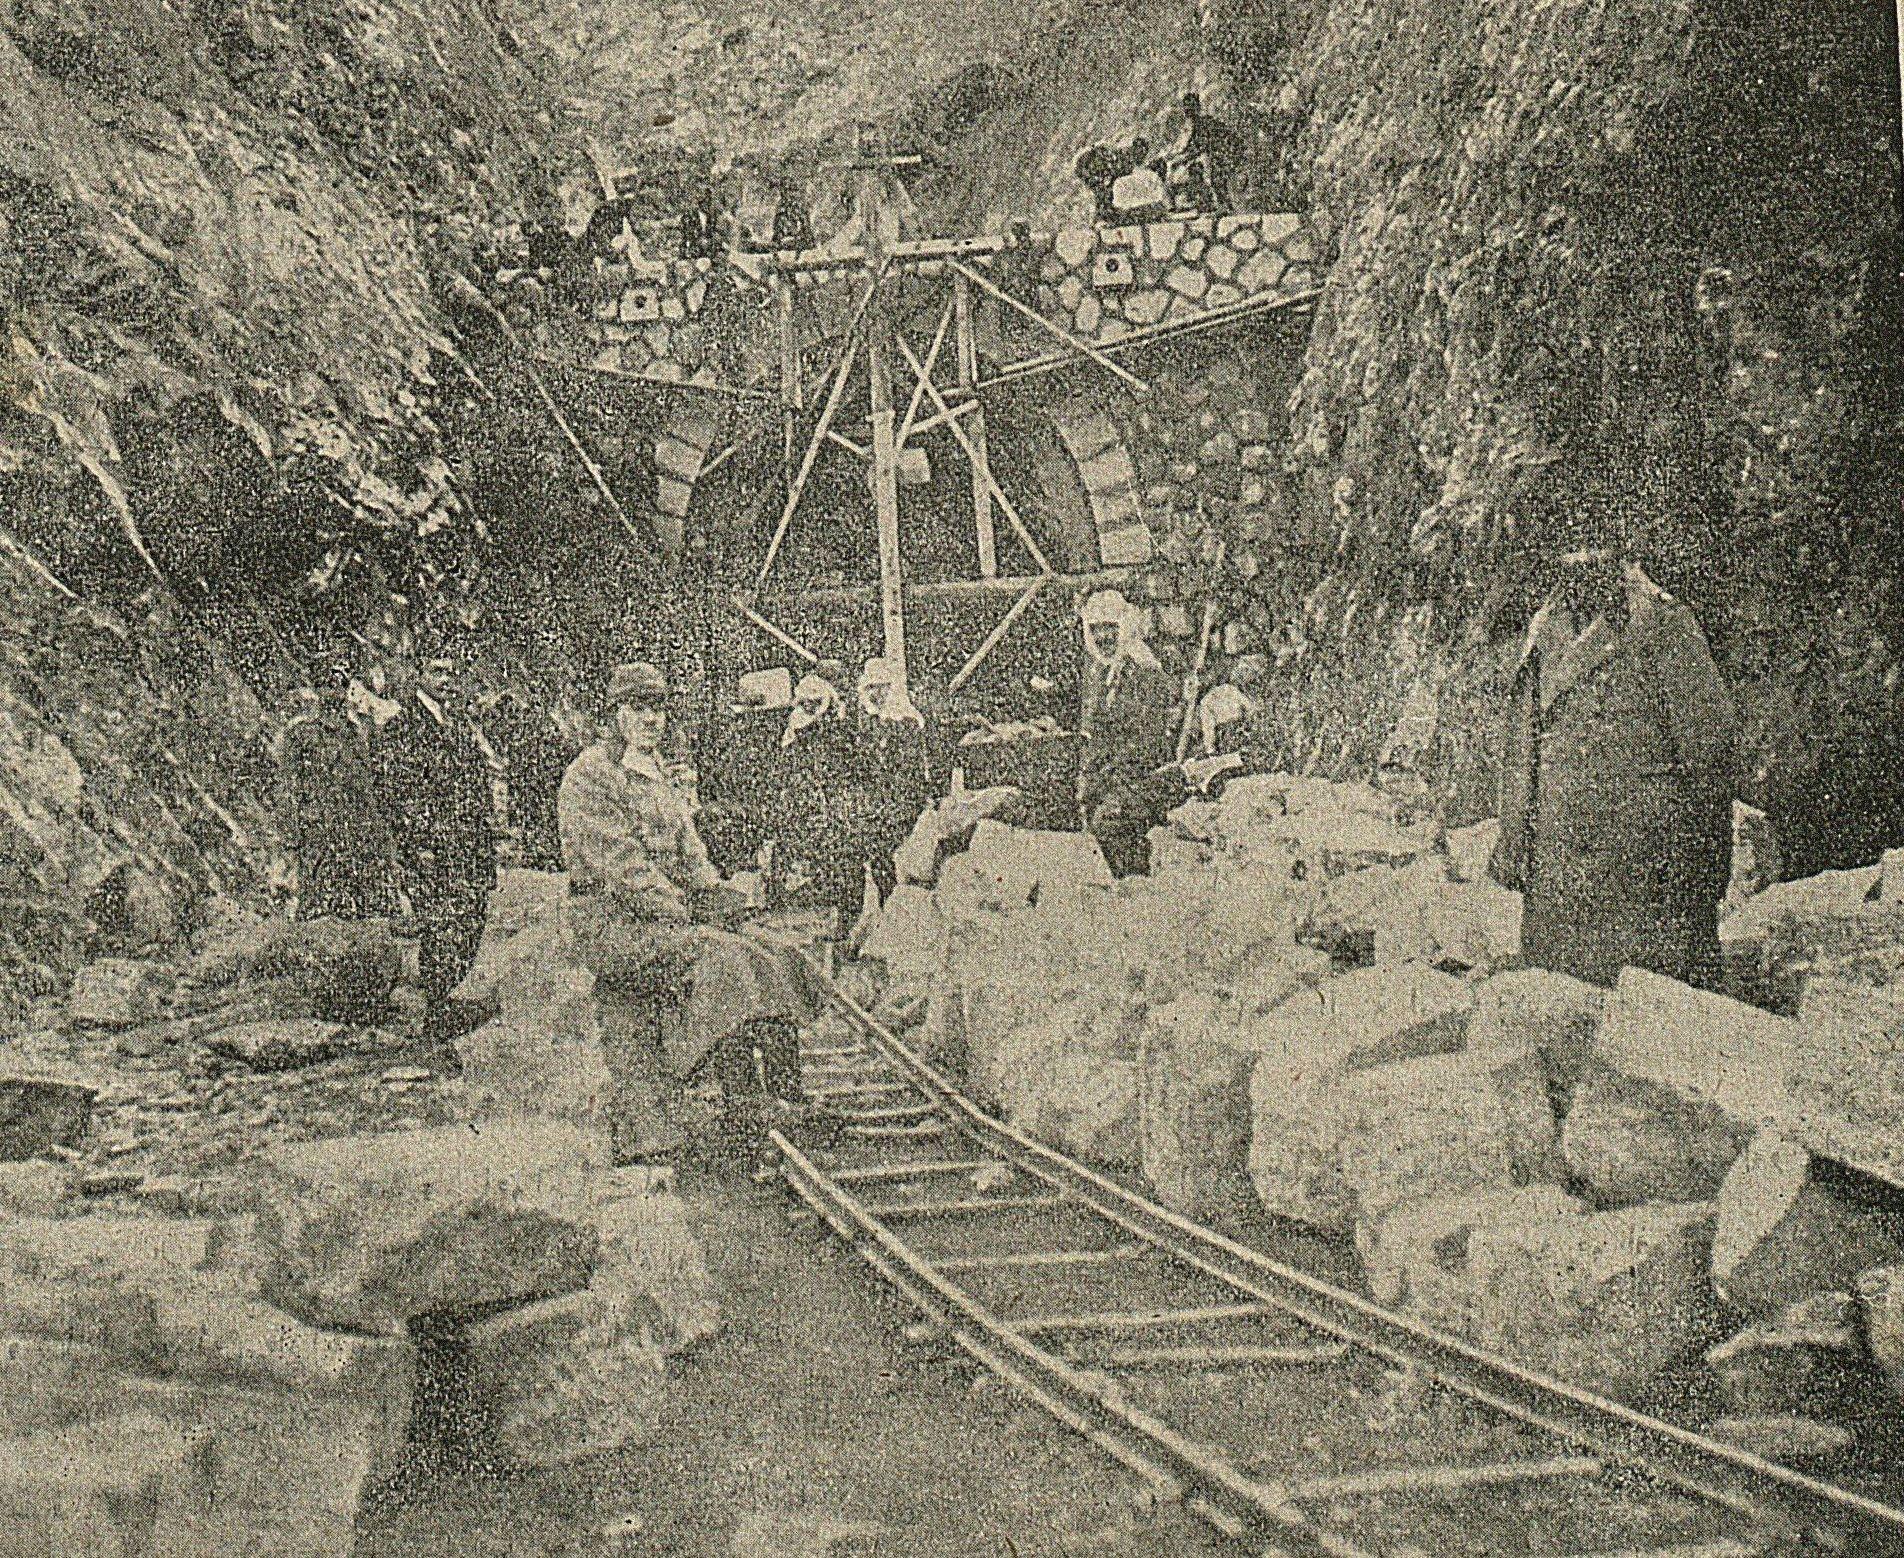 DONANMA MECMUASI 87 / 136 - 13 Eylül 1917